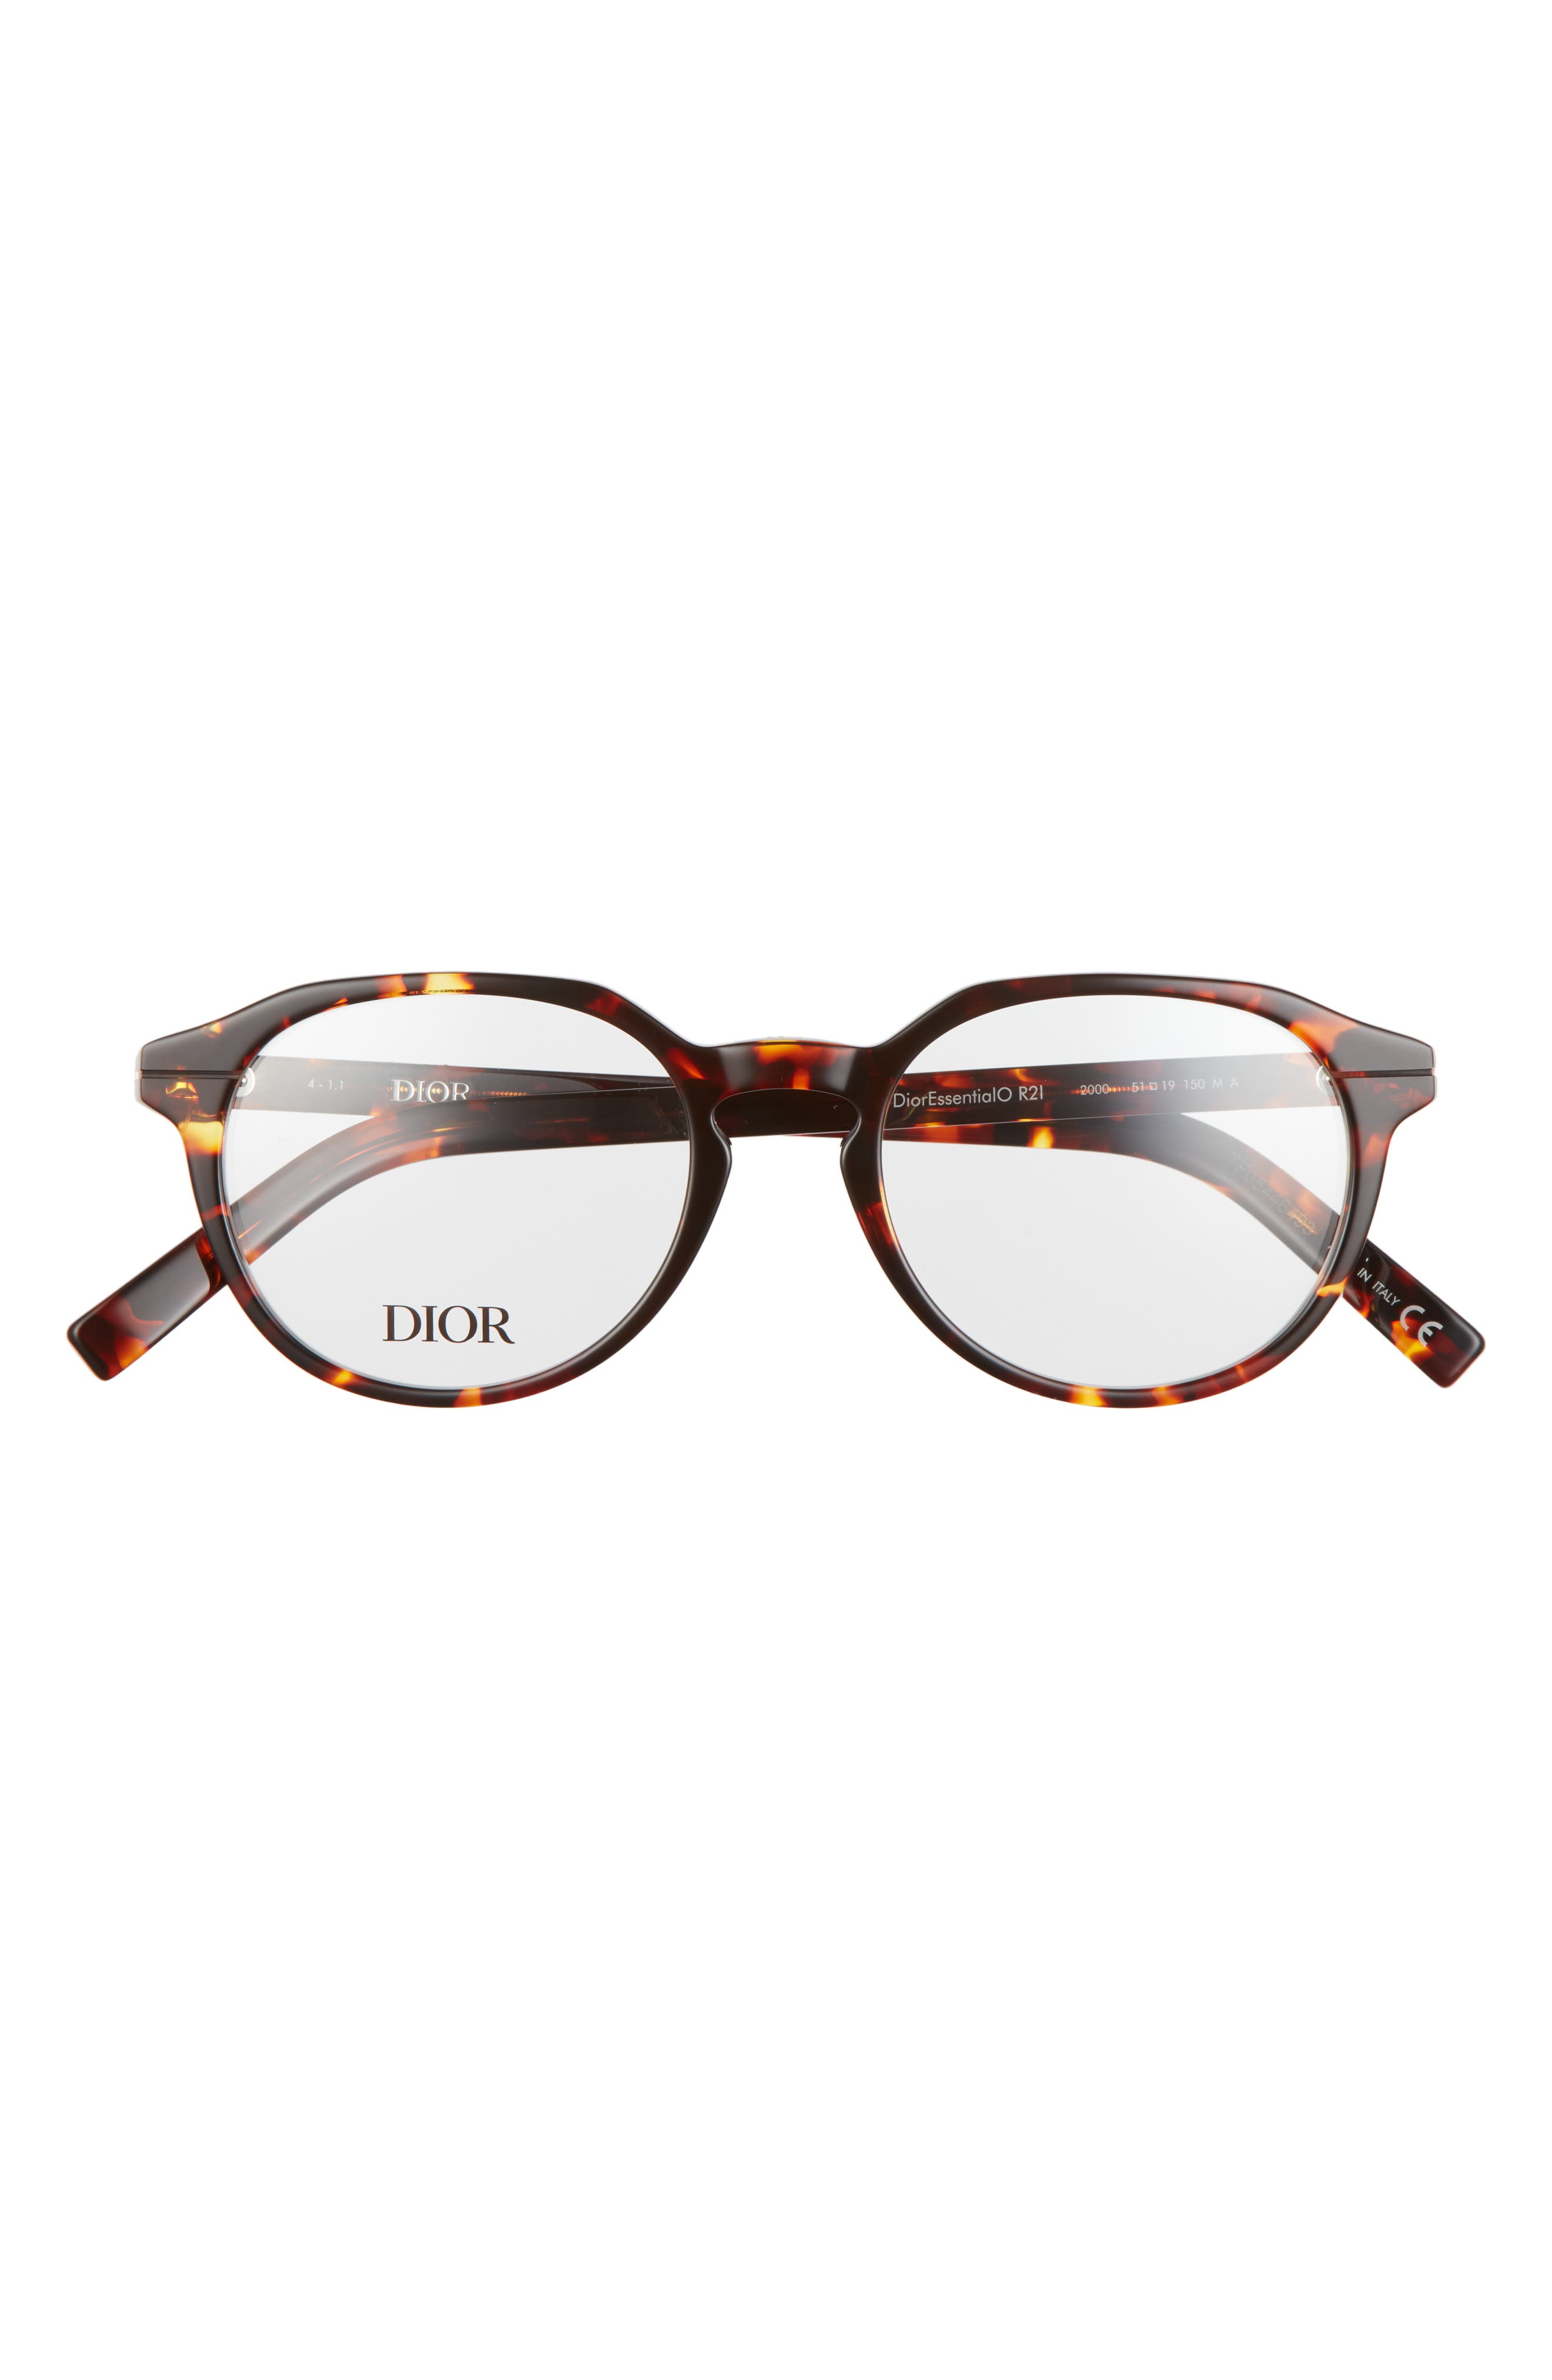 Men's Dior 51mm Round Optical Glasses